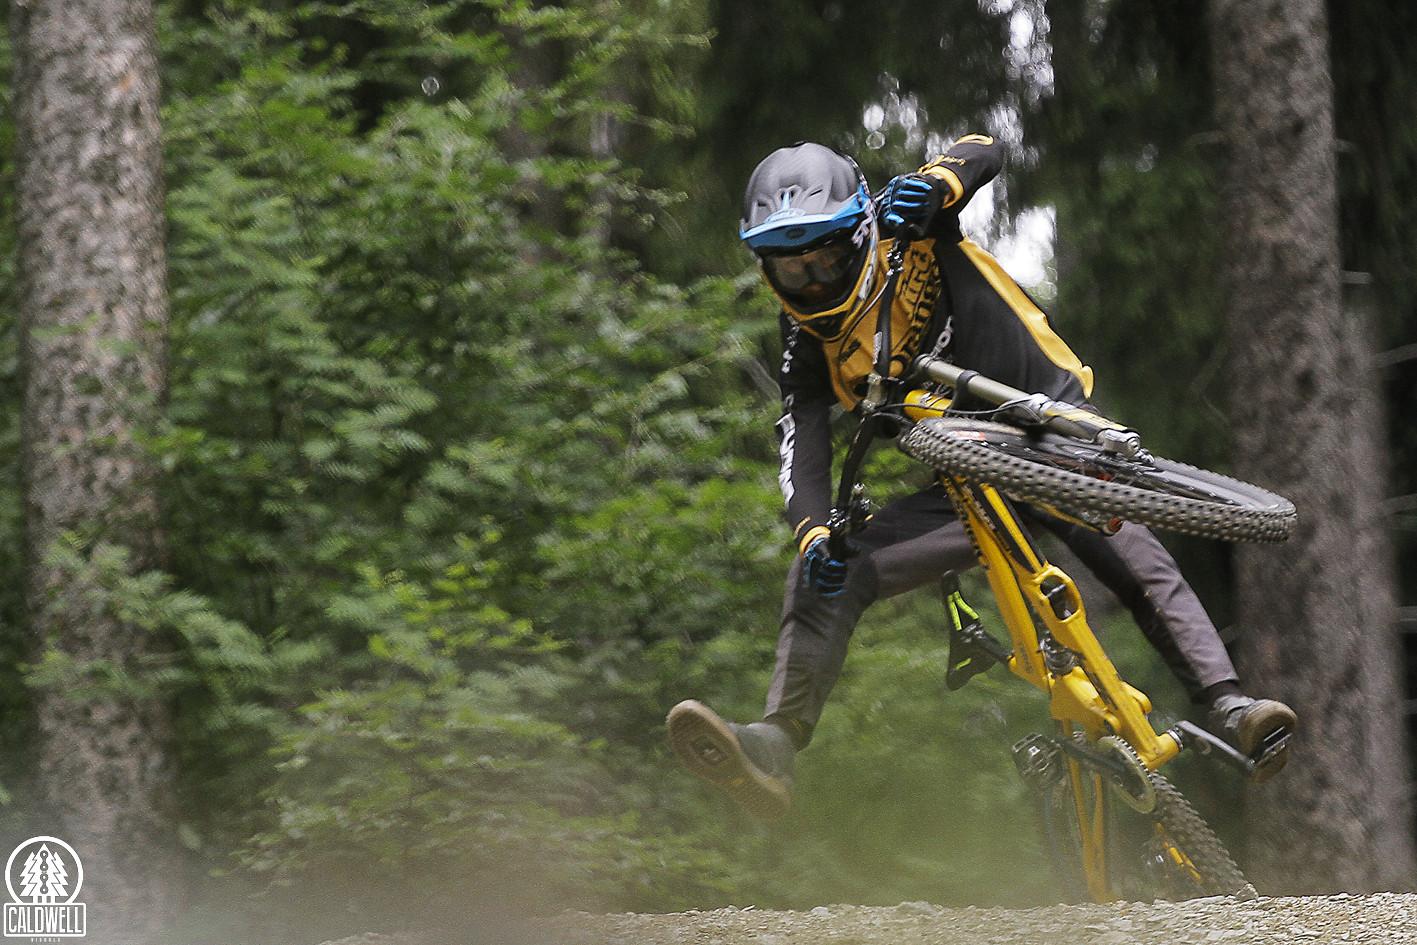 Major leg swag, bro - CaldwellVisuals - Mountain Biking Pictures - Vital MTB